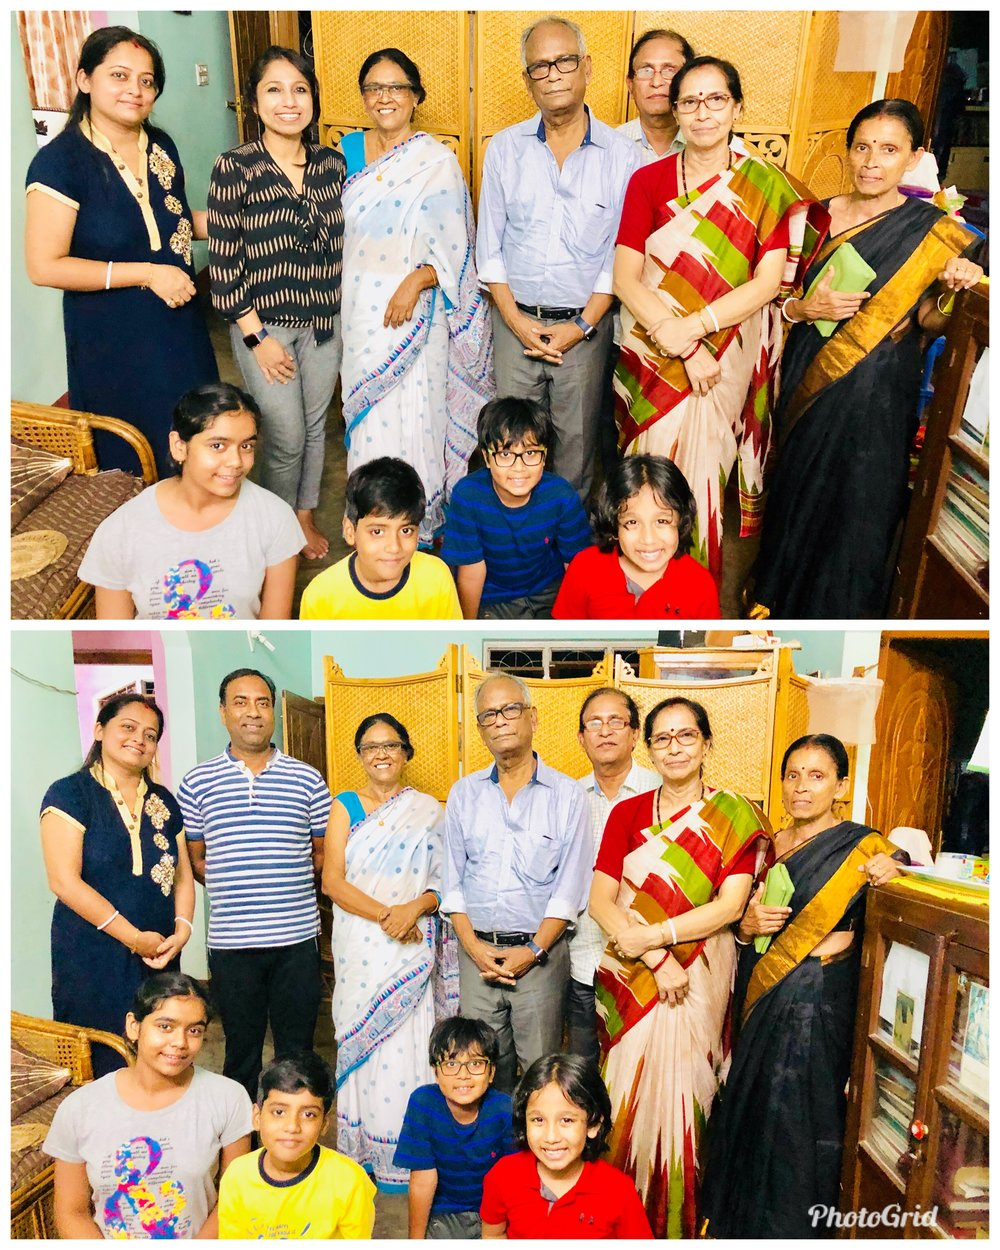 I am sincerely thankful to Mrs. Shibani Brahmachari, Mrs. Tomali Brahmachari and Mr. Rajarshi Brahmachari for their warmth and affection. L to R bottom picture: Mrs. Tomali Brahmachari, Mr. Rajarshi Brahmachari, Mrs. Shibani) Bharmachari; Dr. C. S Das, Mr. K.S Das, Mrs. Rita Das and Mrs. Krishna Das